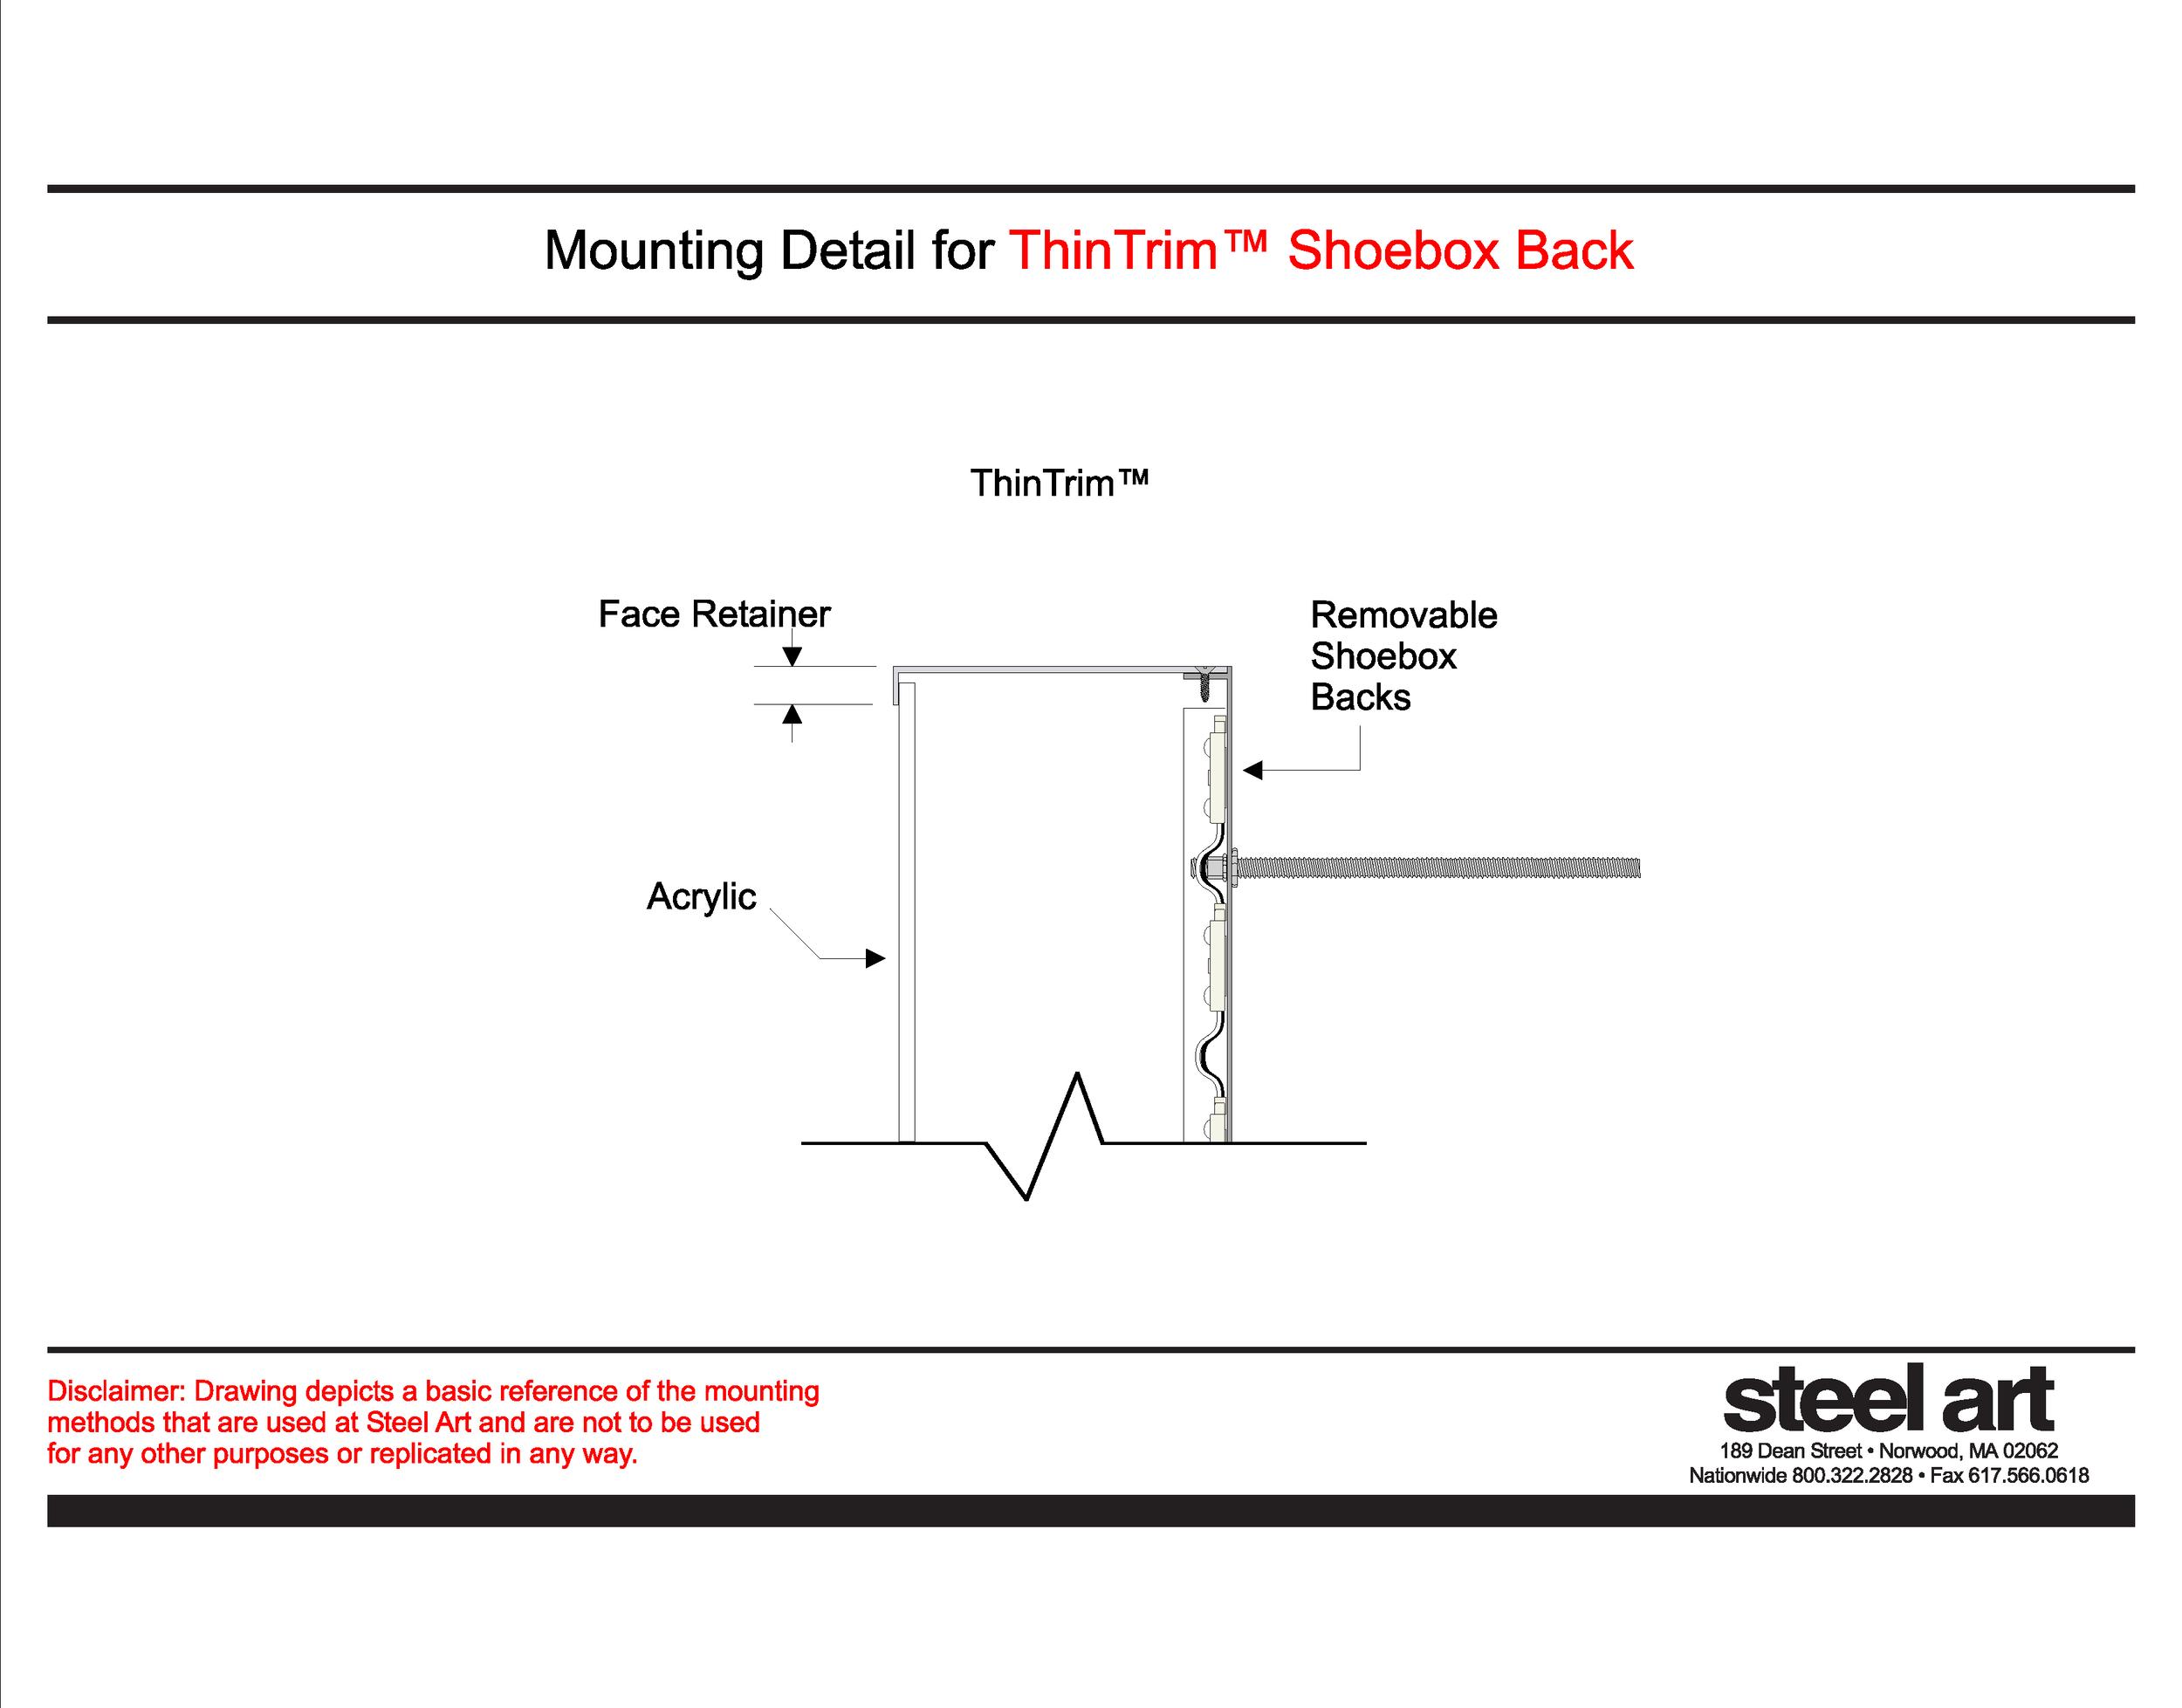 Mounting Detail for ThinTrim Shoebox Backs.png